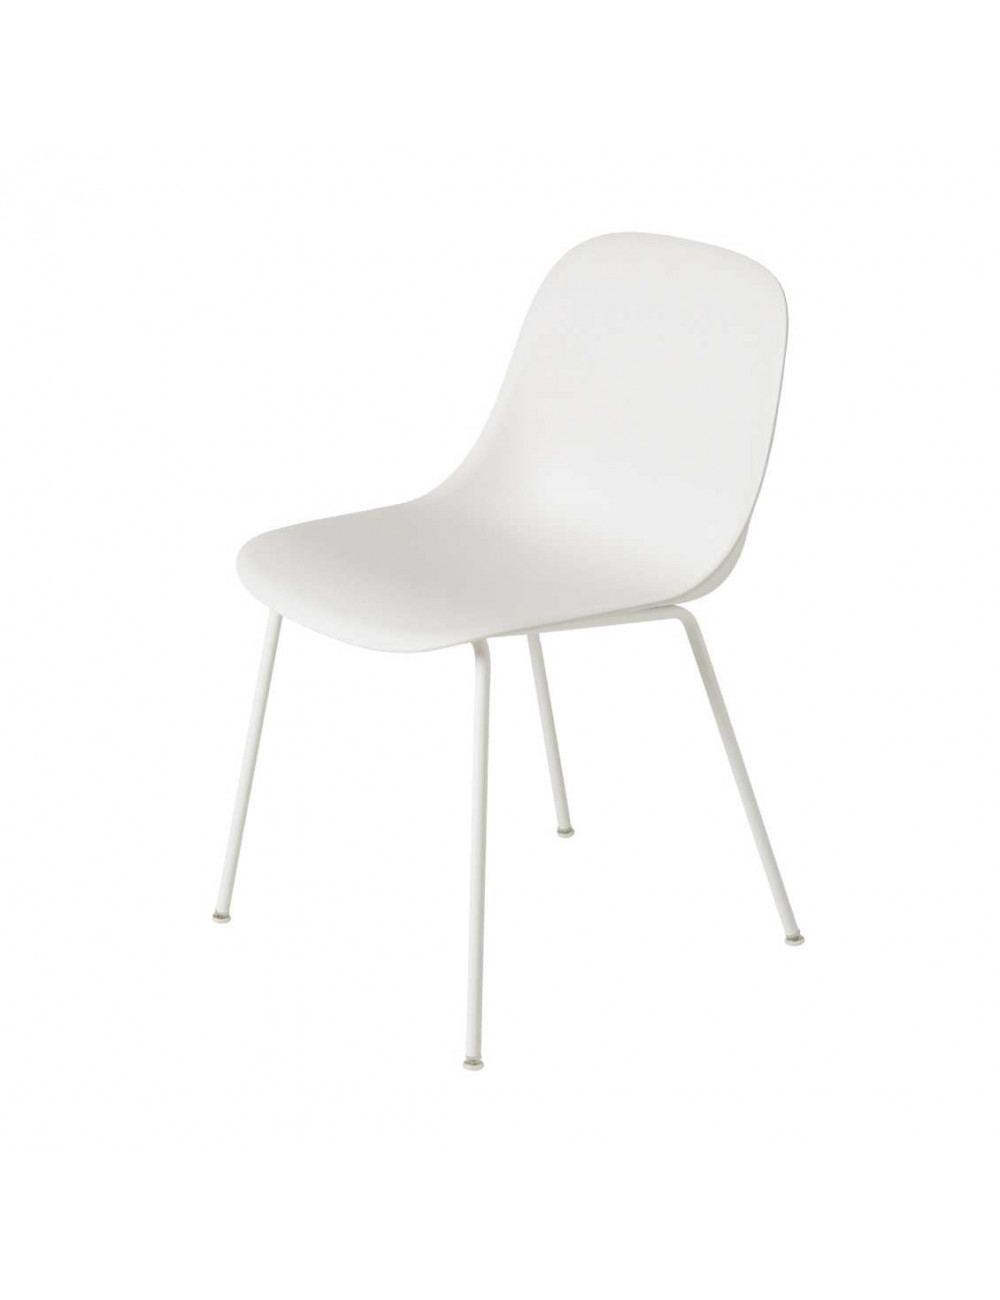 Showroommodel Stoel Fiber Side Chair Tube | wit/metalen poten